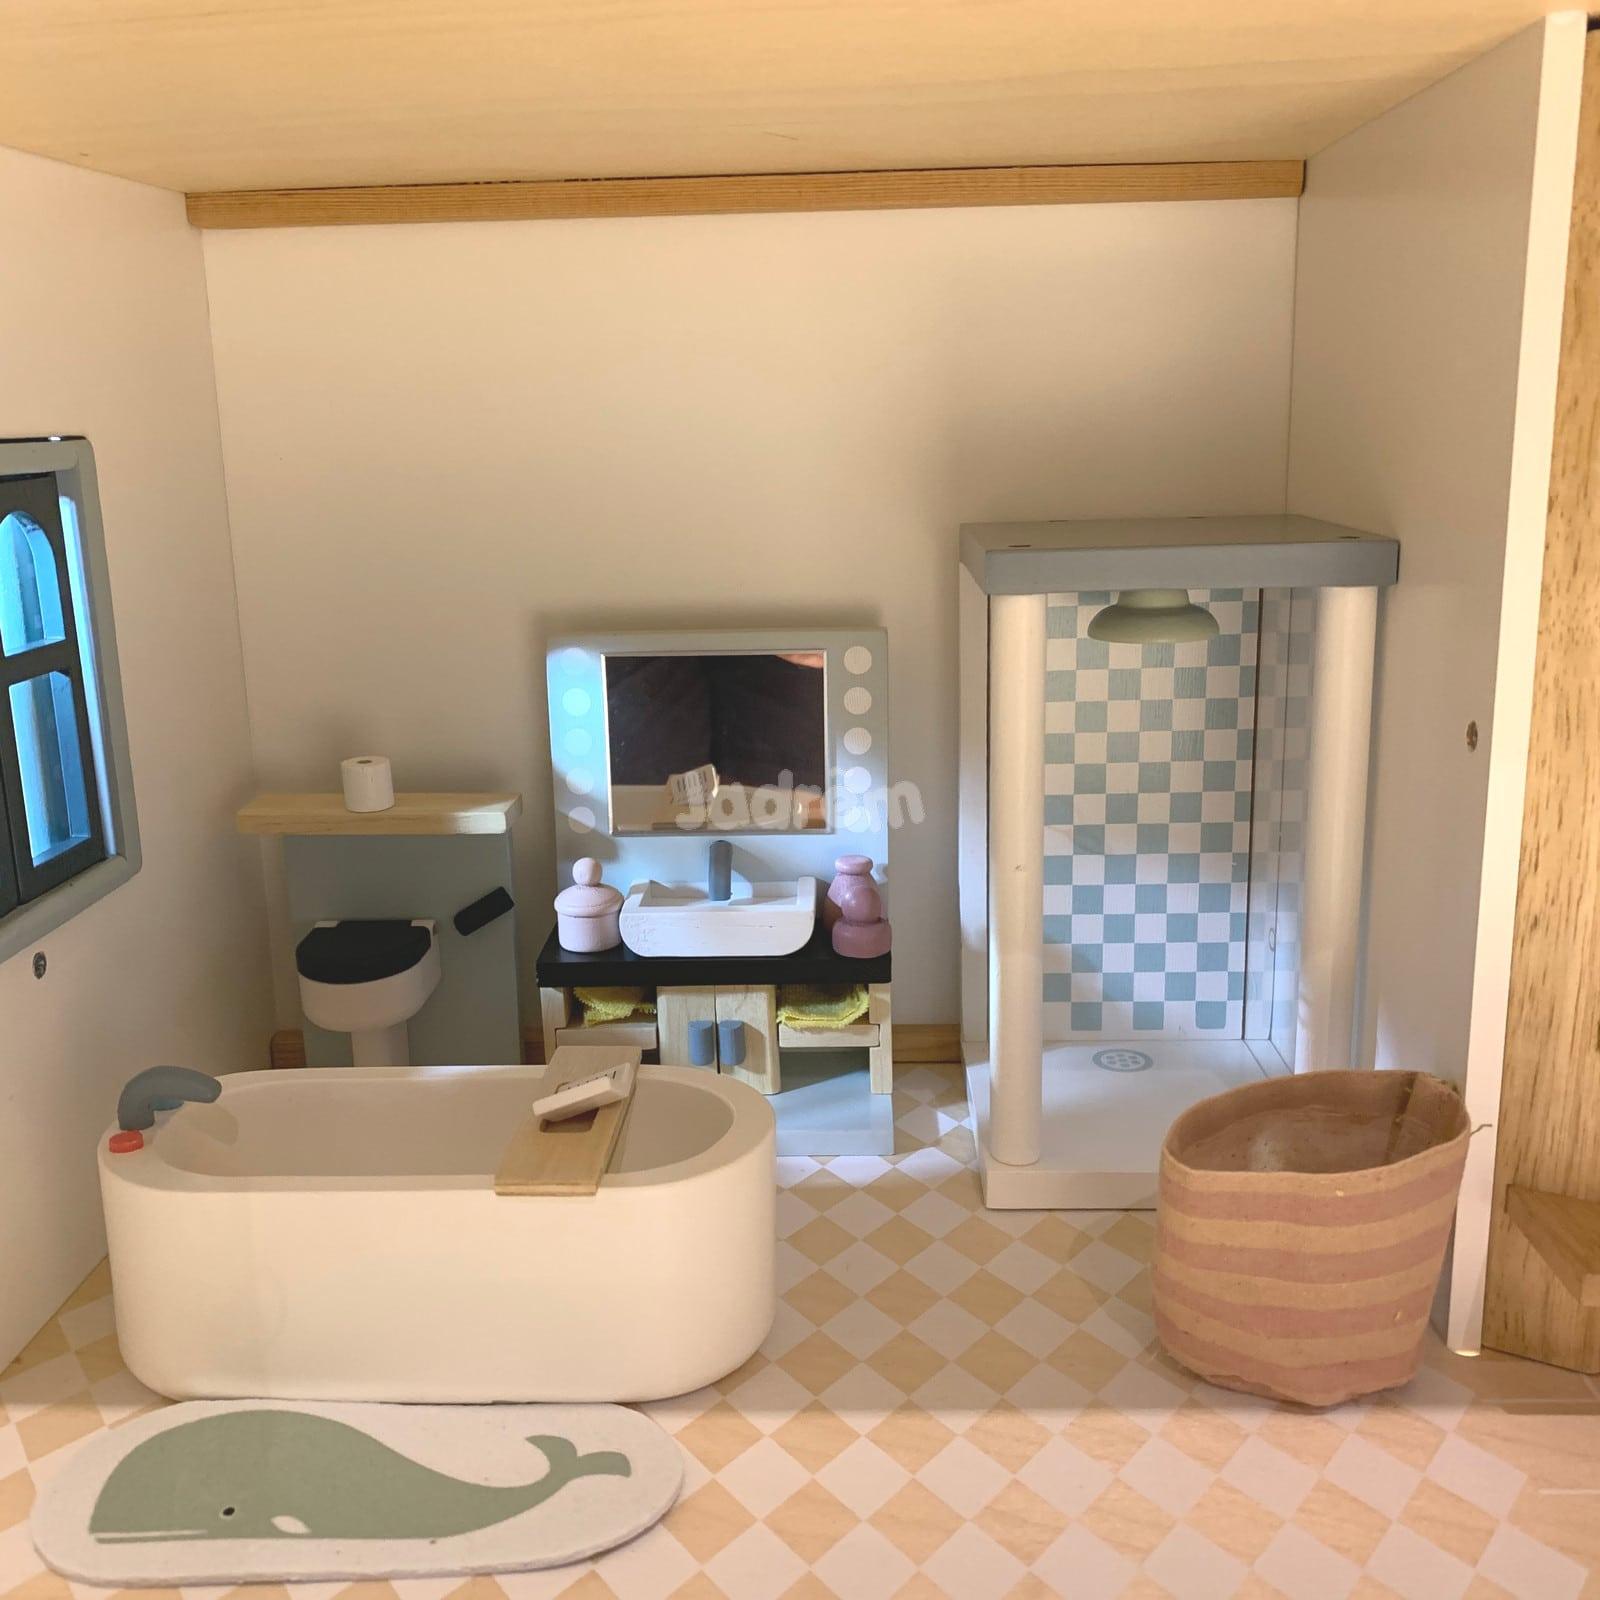 Tender Leaf Dovetail Bathroom Set Dollhouse Furniture - Jadrem Toys